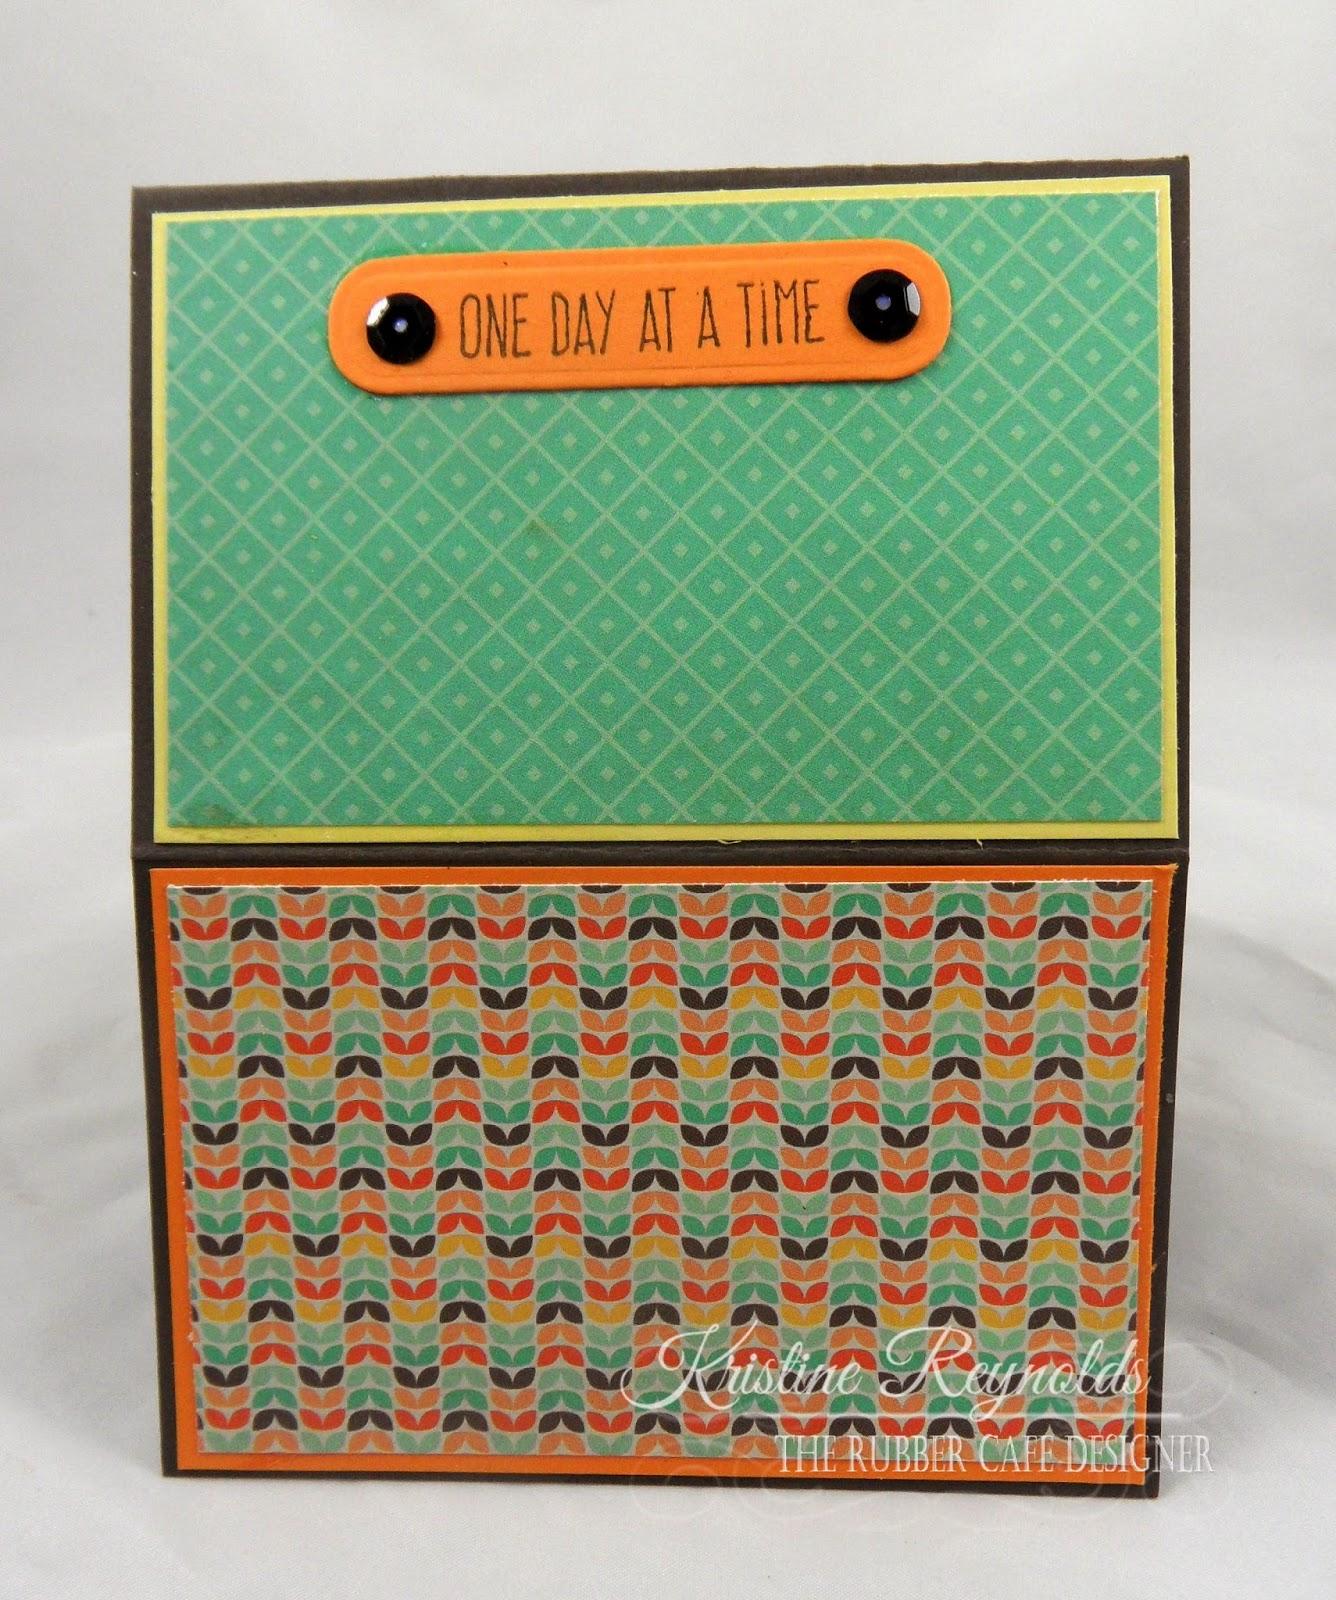 the rubber cafe design team blog: easel shaker card